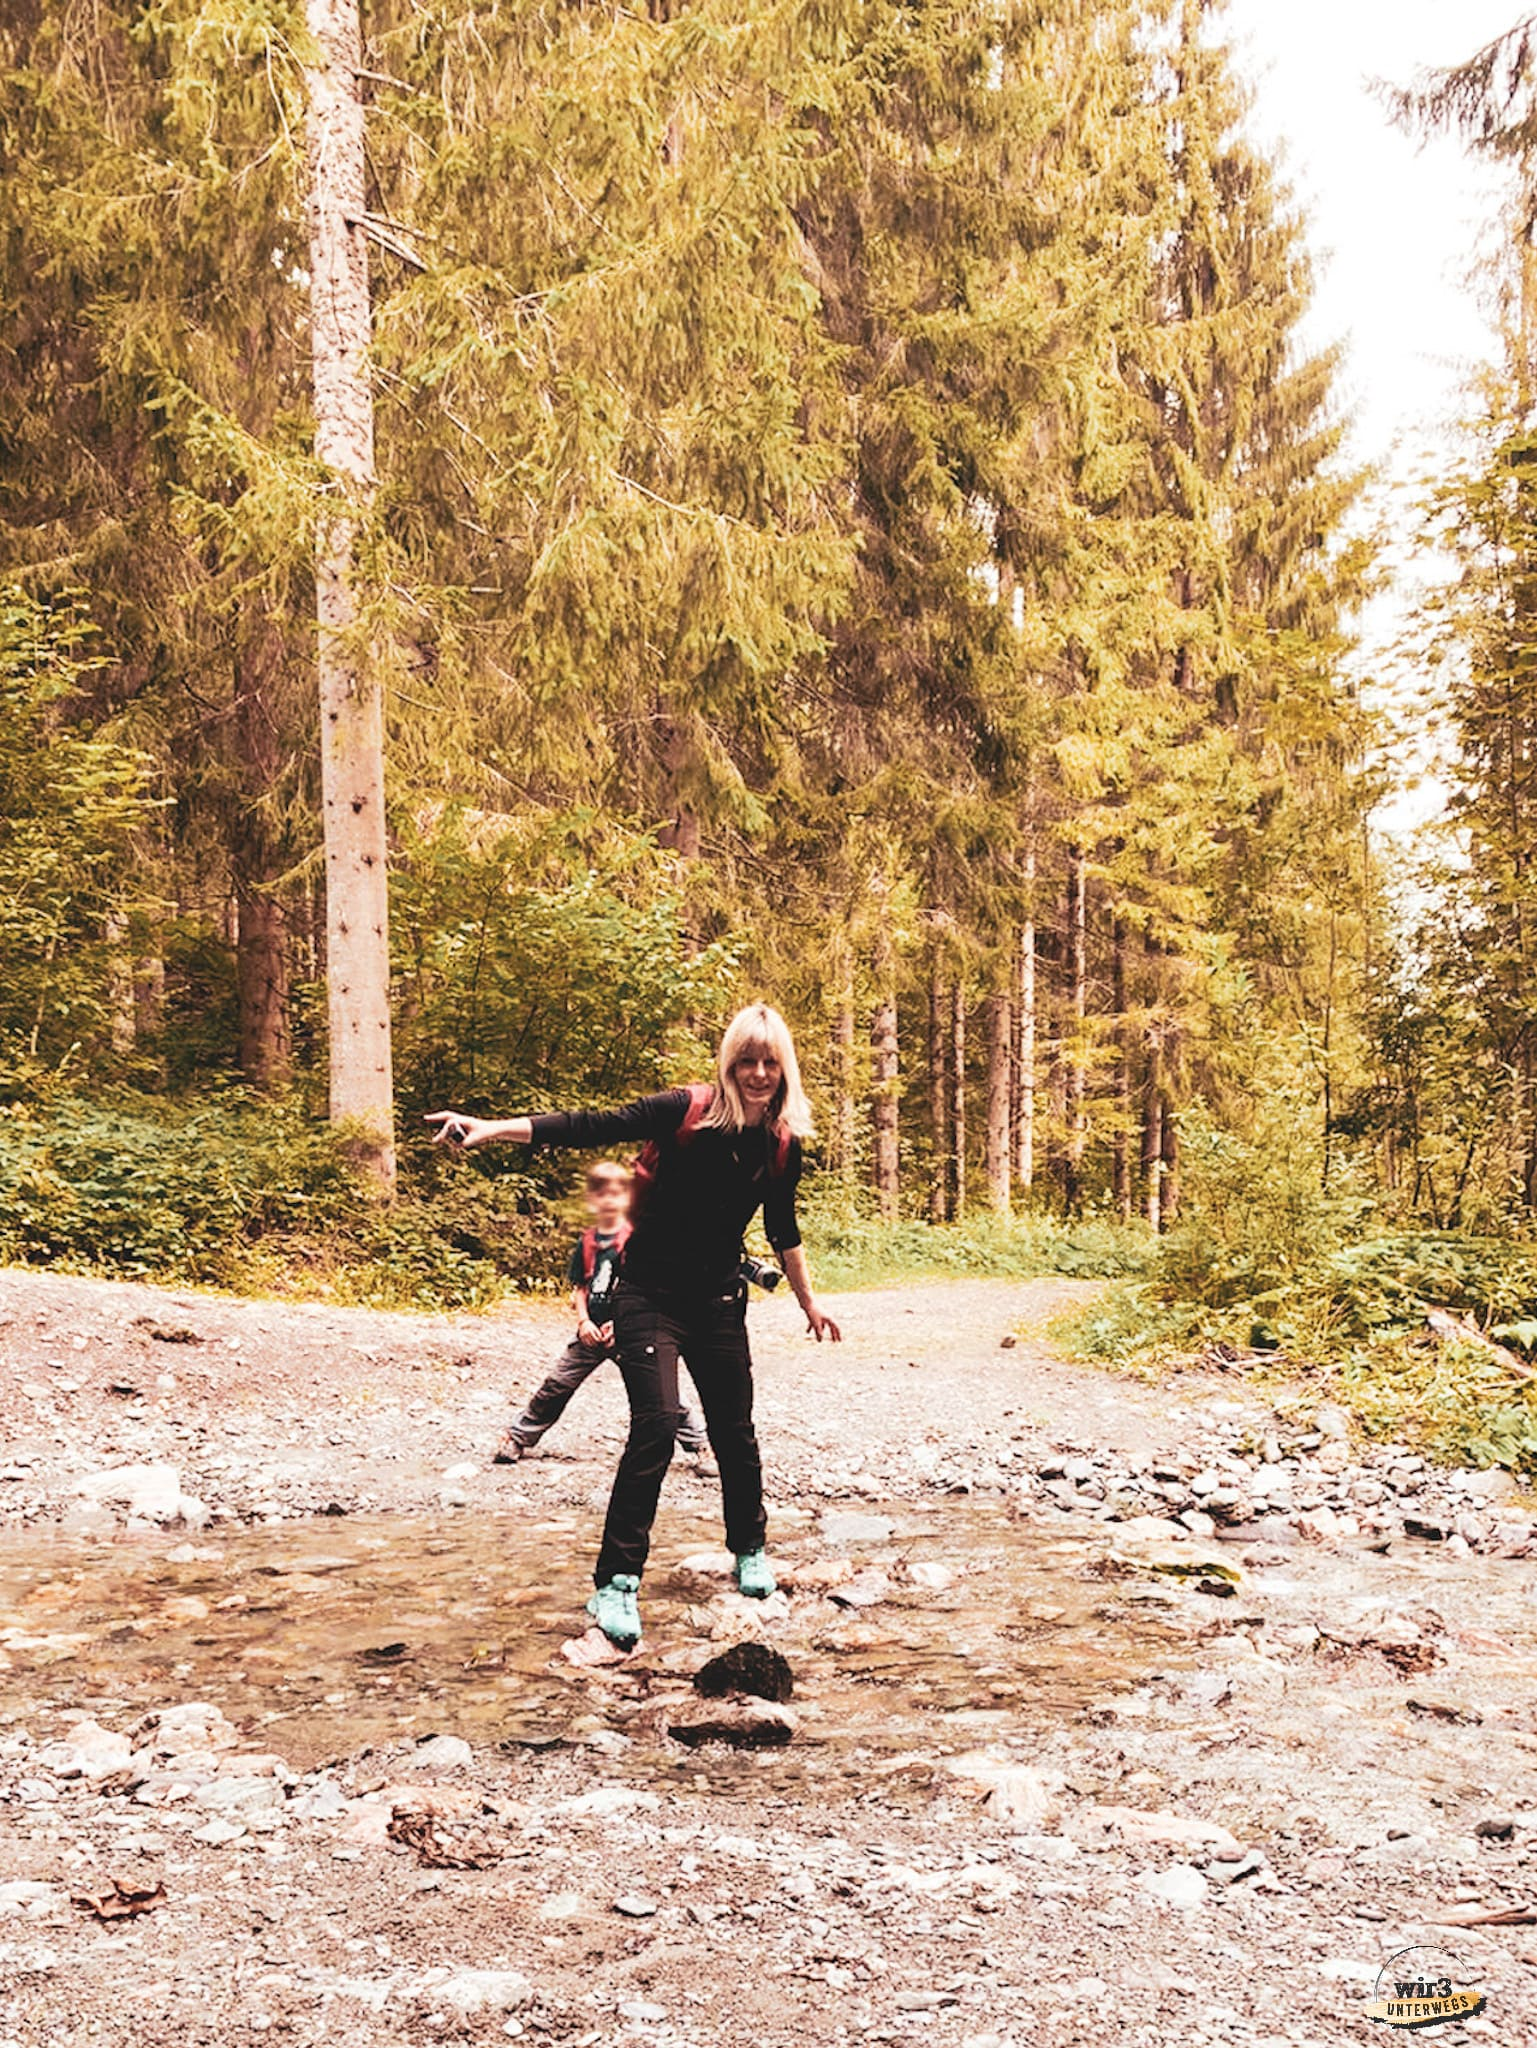 Wanderspass in Tirol